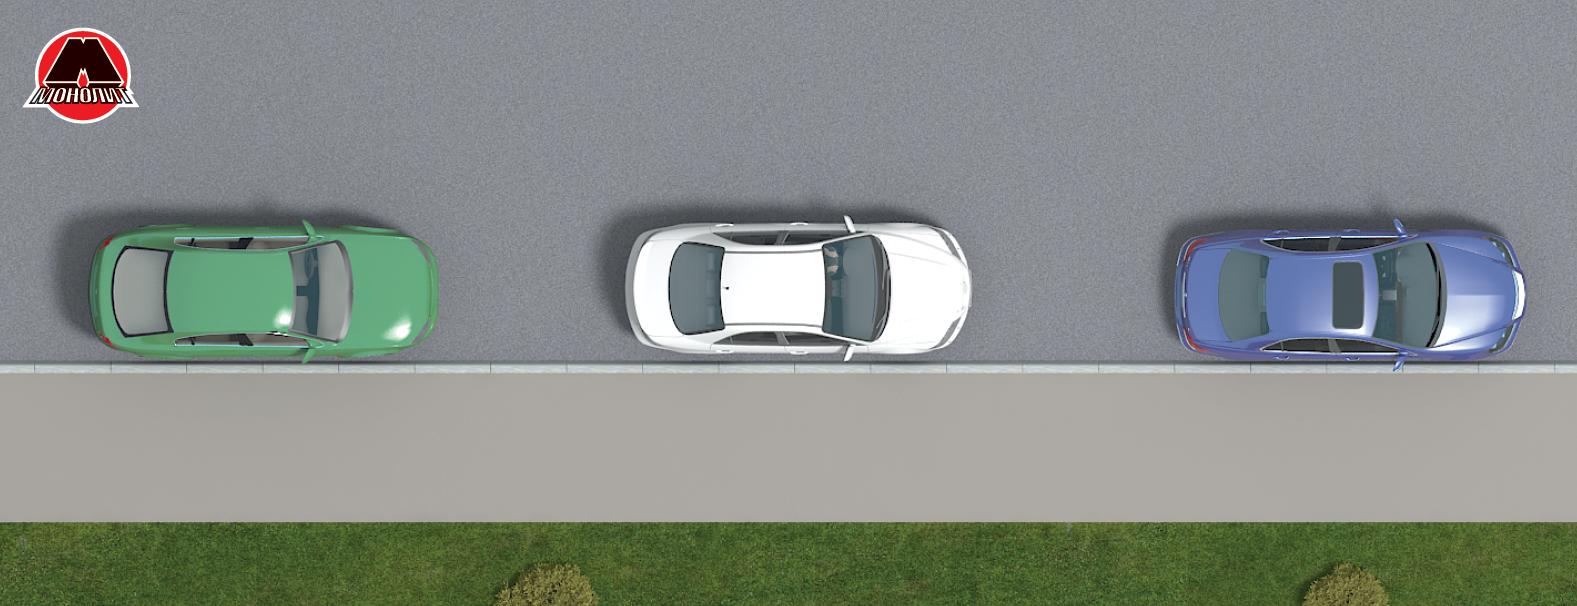 Зазоры между авто